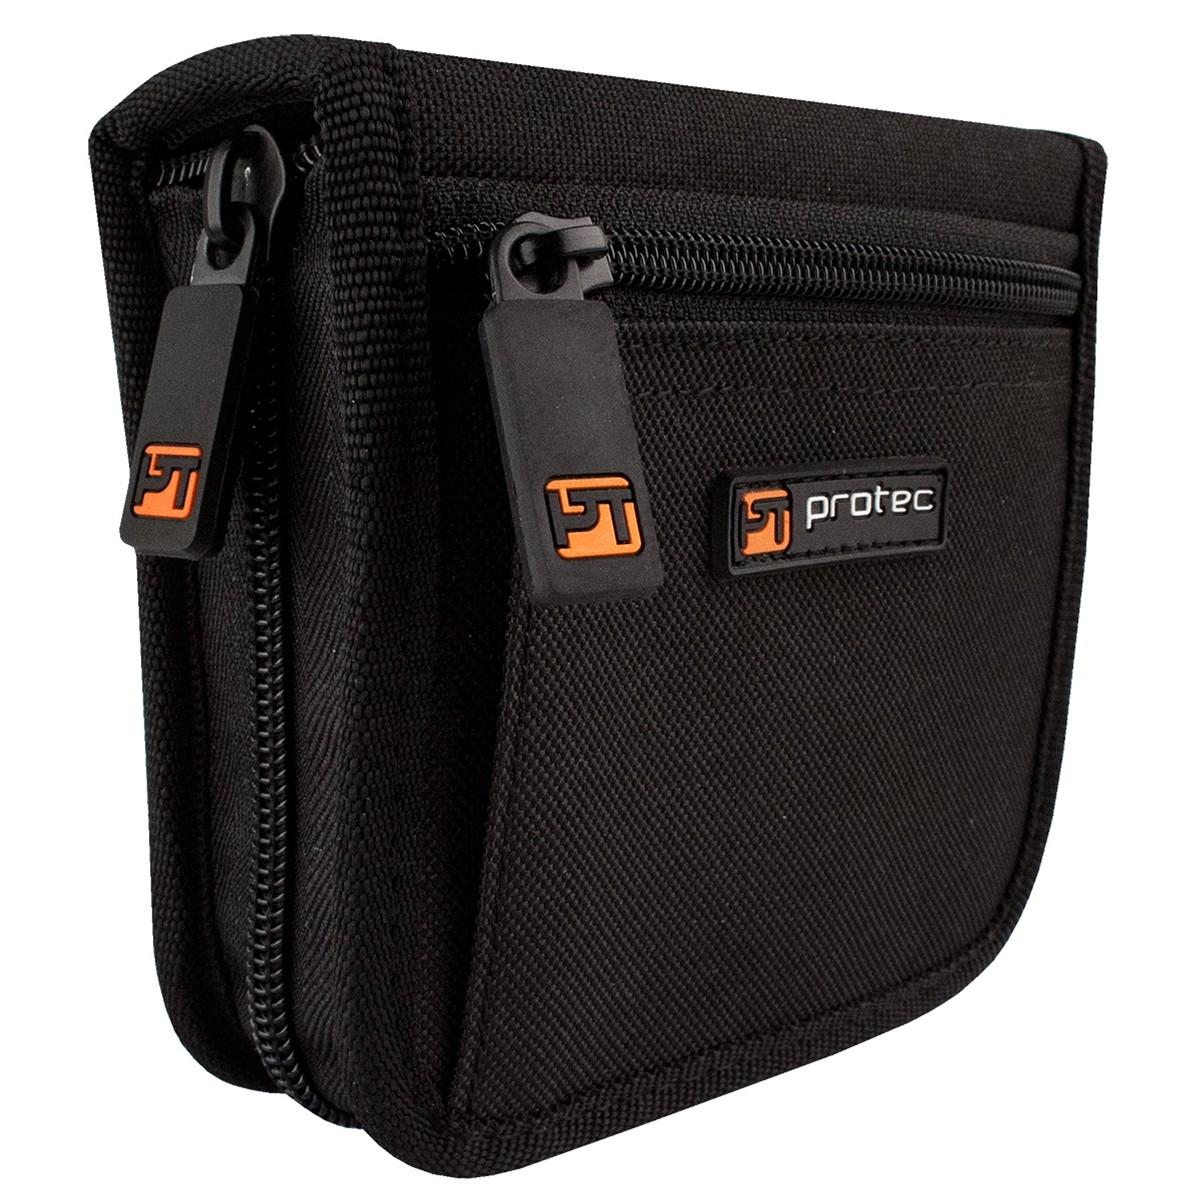 Protec Tuba Mouthpiece Pouch with Zipper (A211ZIP)